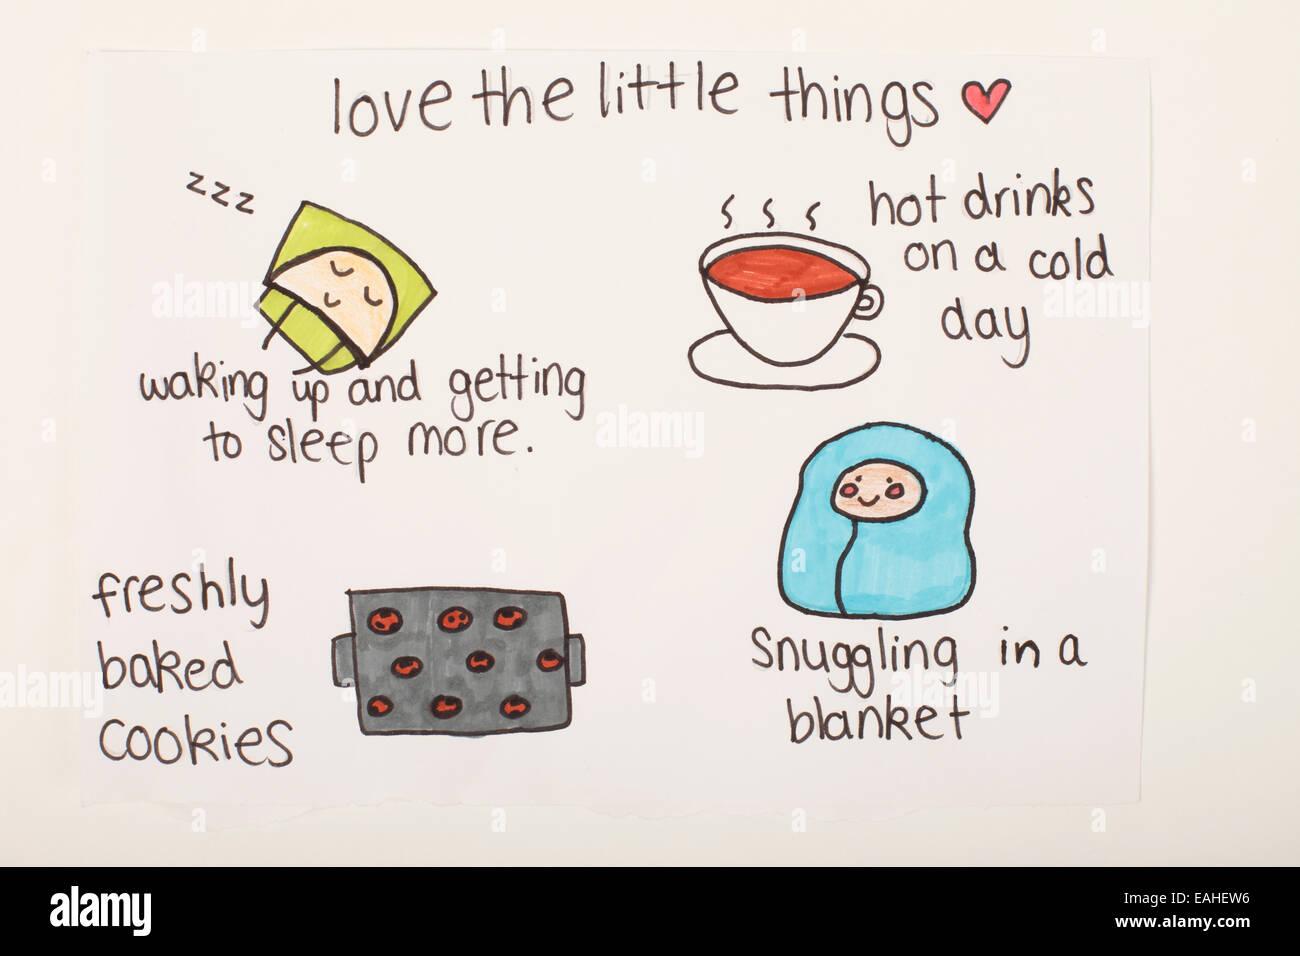 life story advice drawing, motivational cartoon. - Stock Image